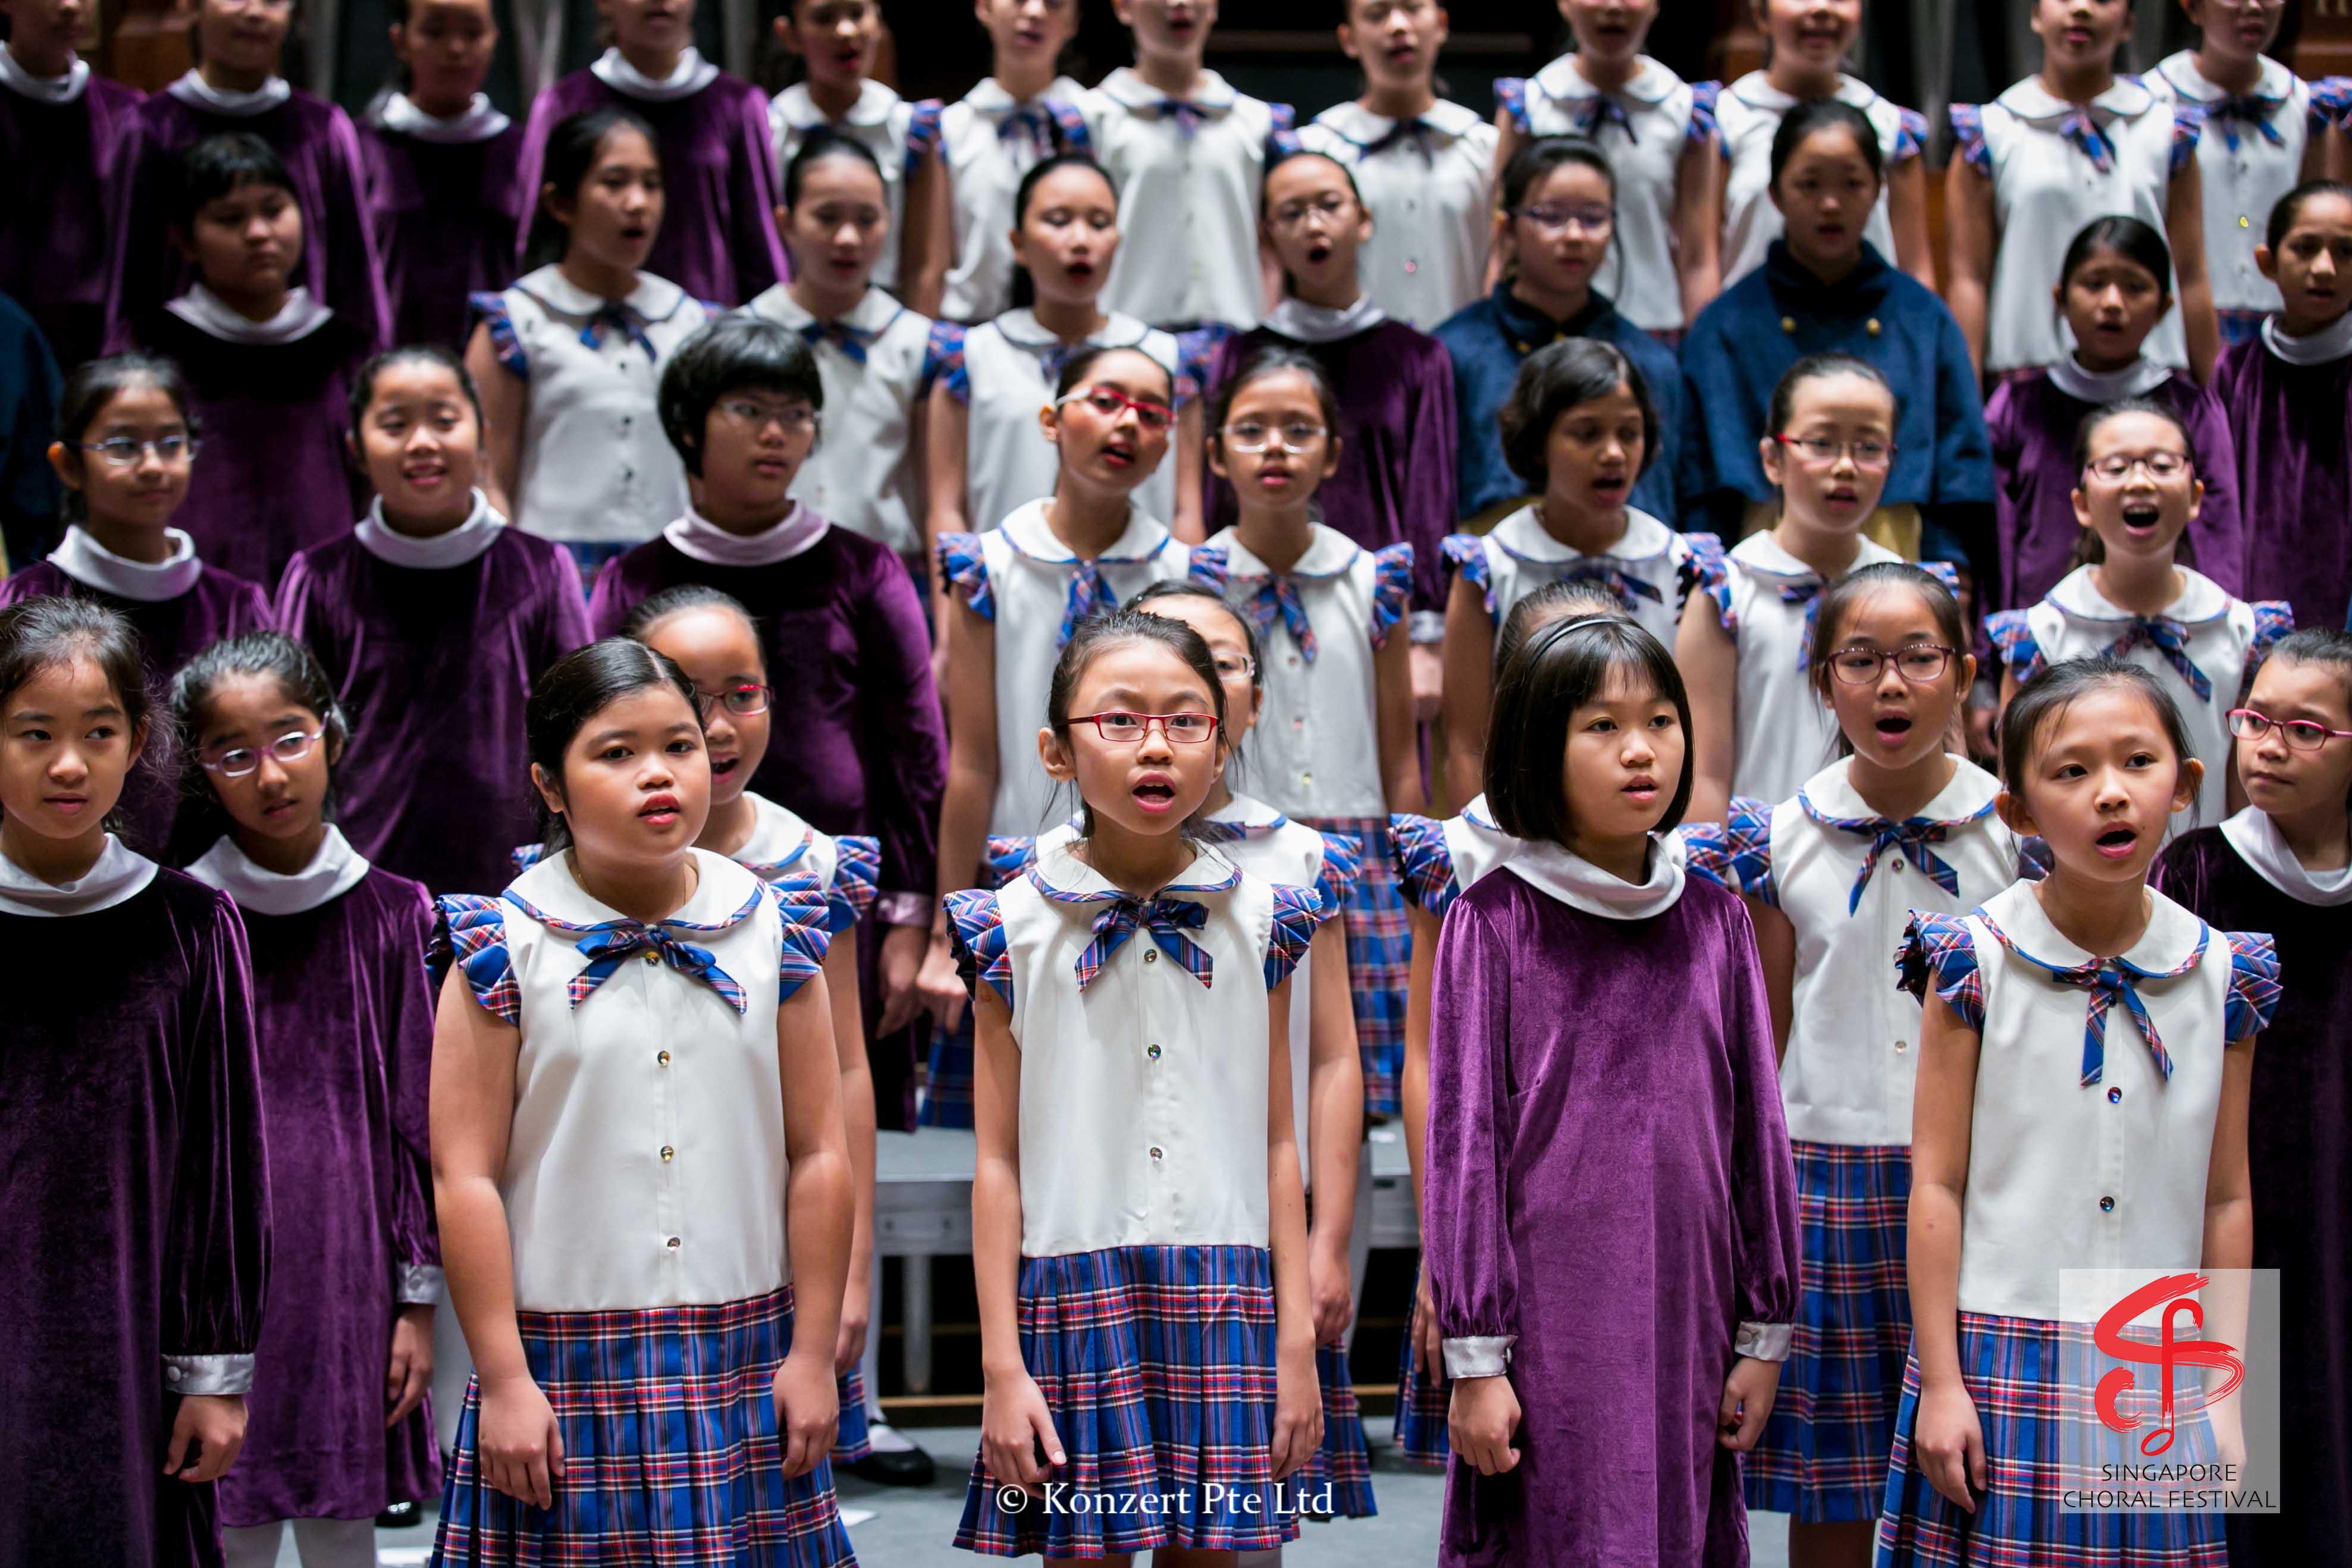 Singapore Choral Festival 8-8-15 (2).jpg